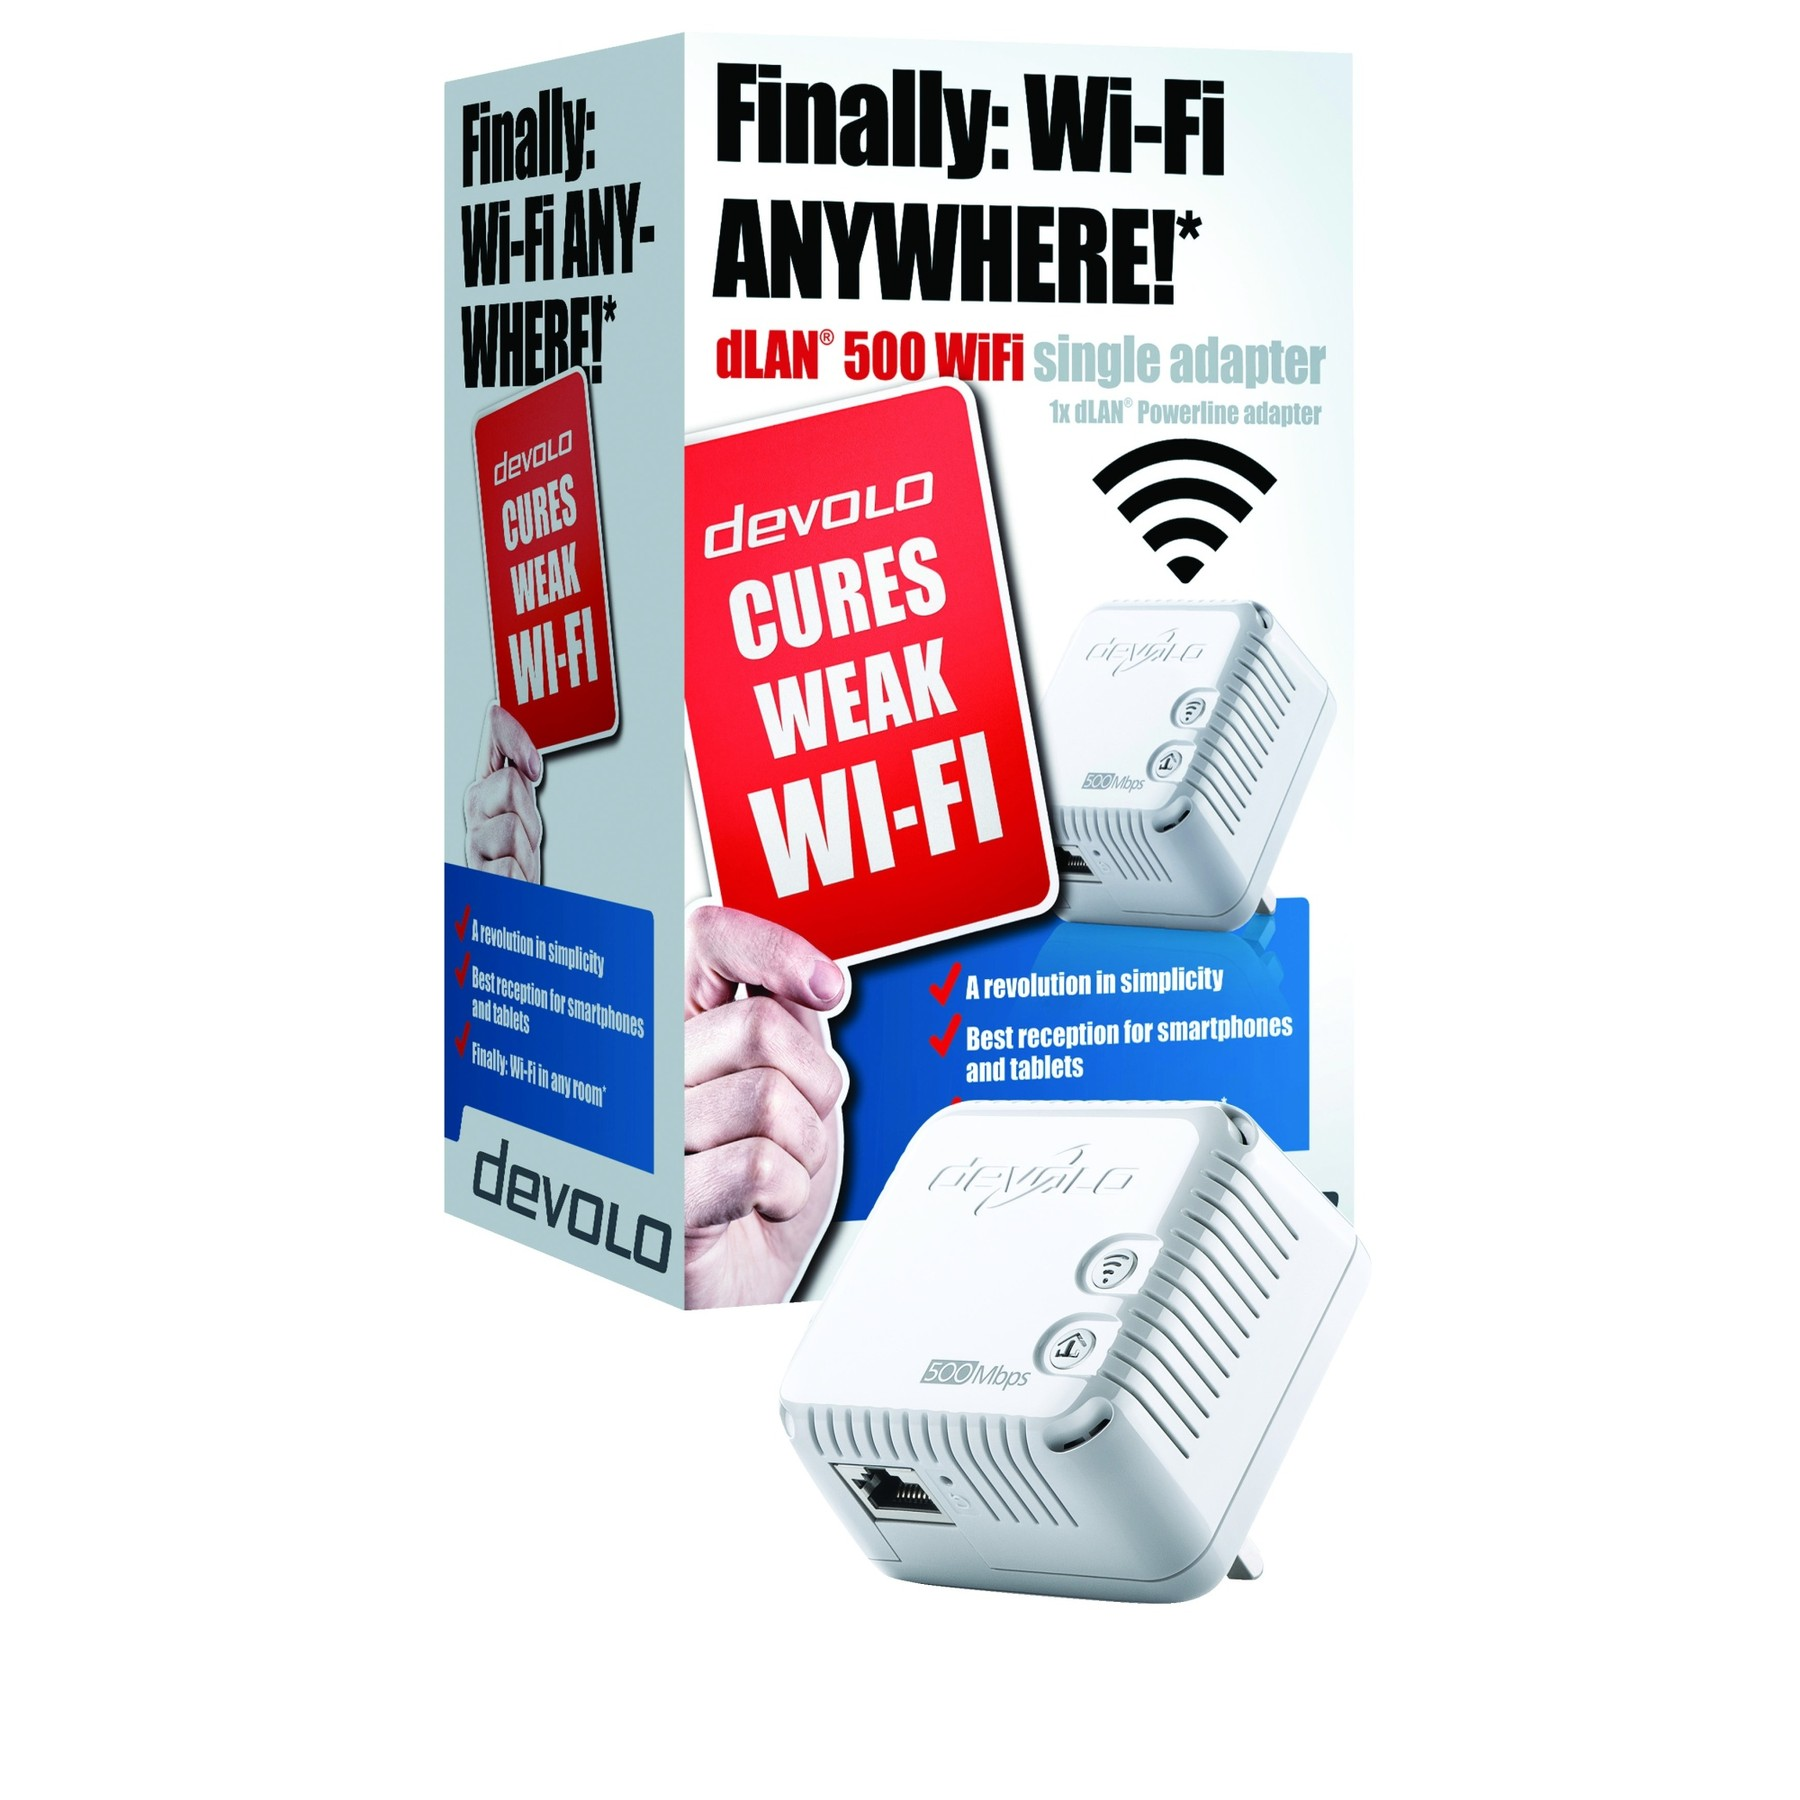 devolo dlan 500 wifi single 500mbps powerline adapter. Black Bedroom Furniture Sets. Home Design Ideas